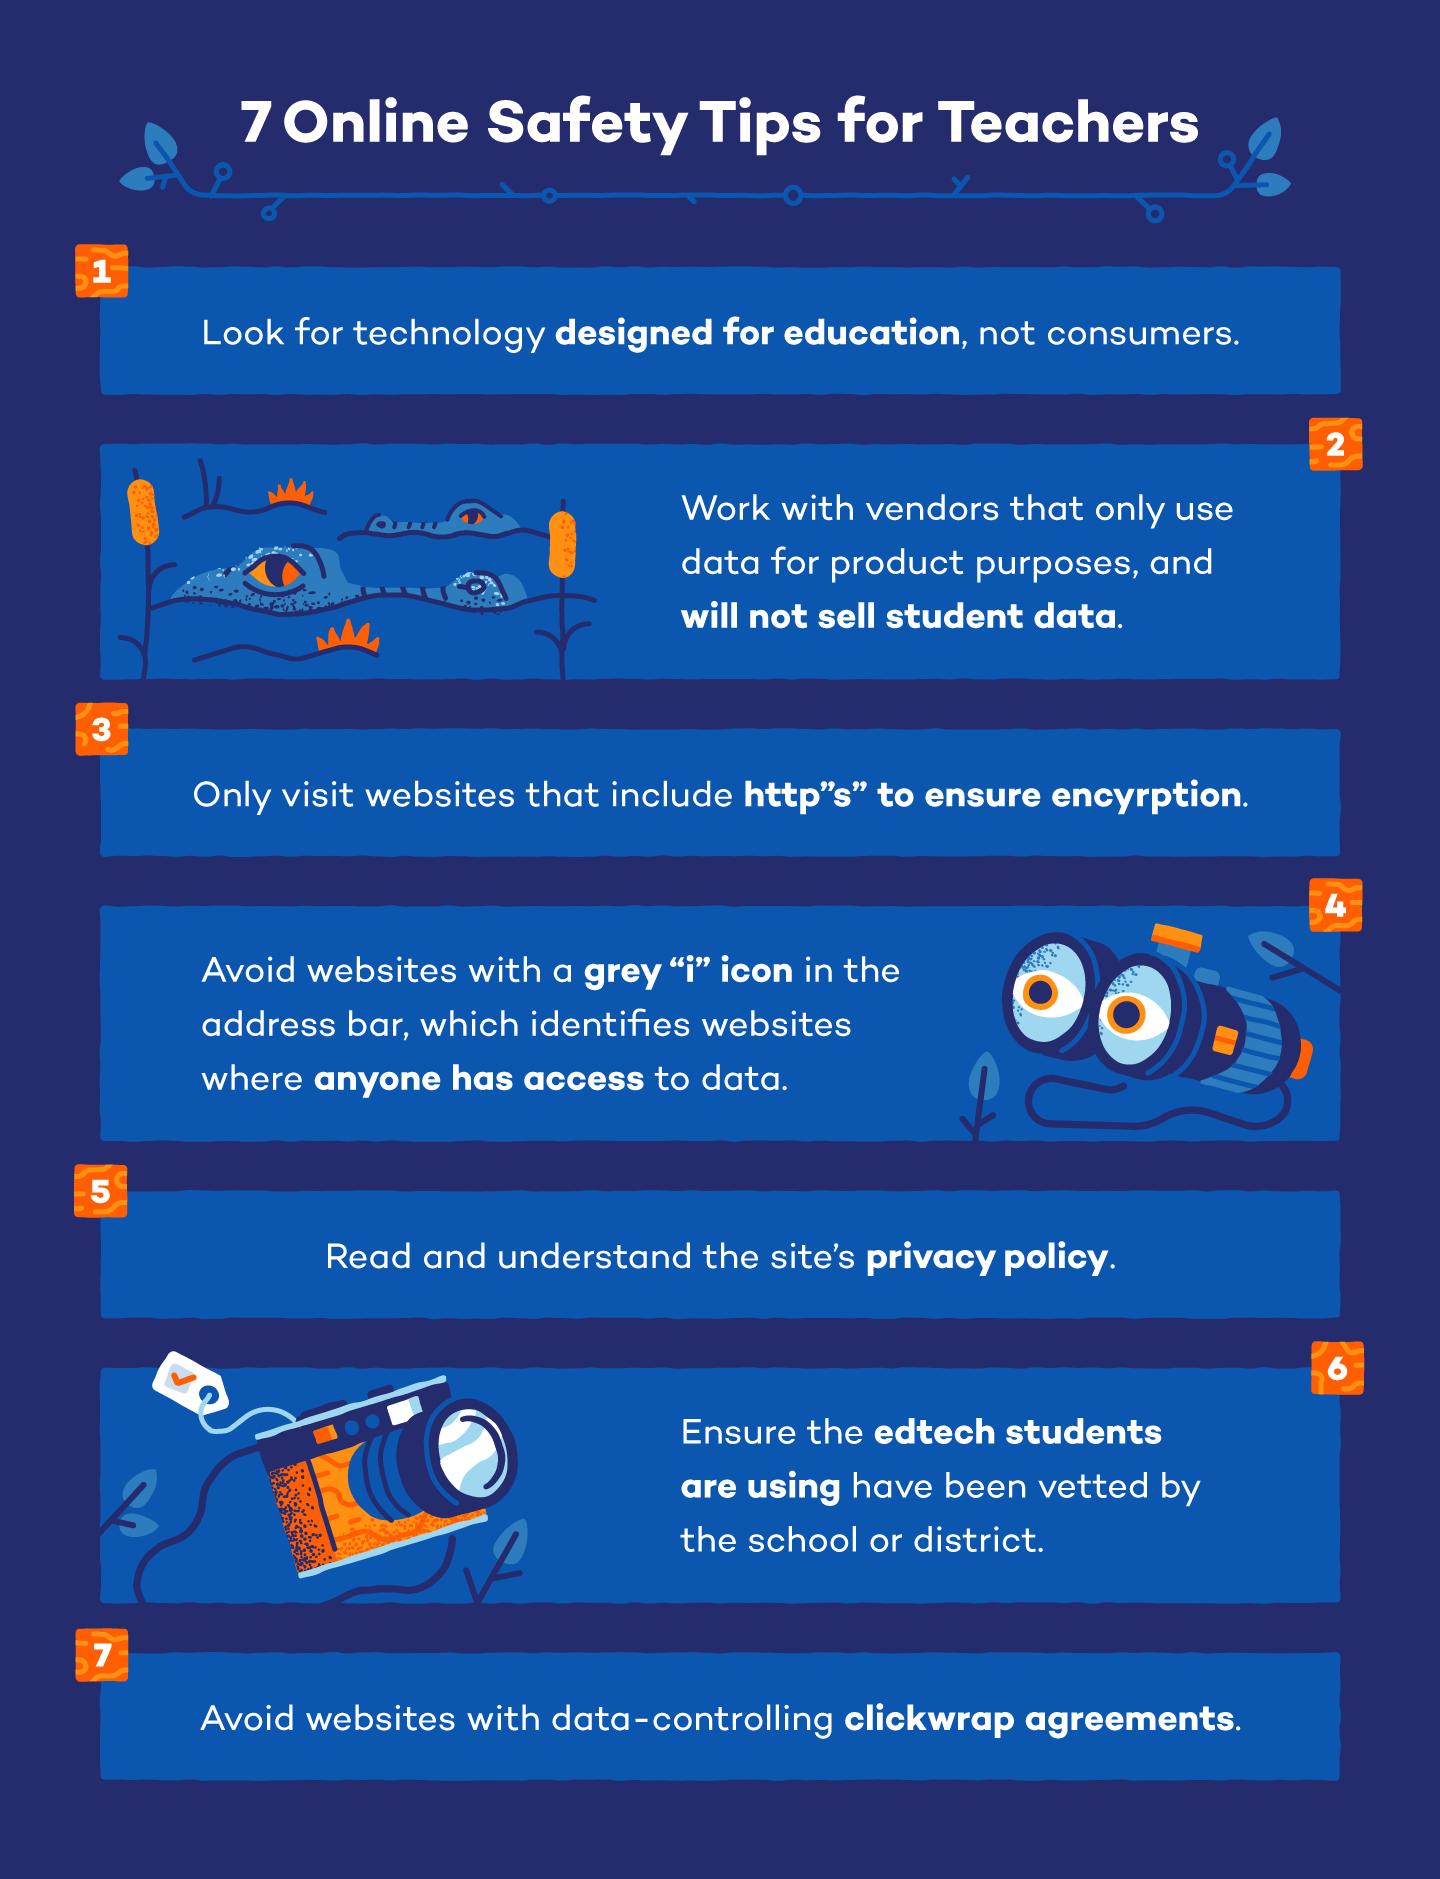 7 online safety tips for teachers